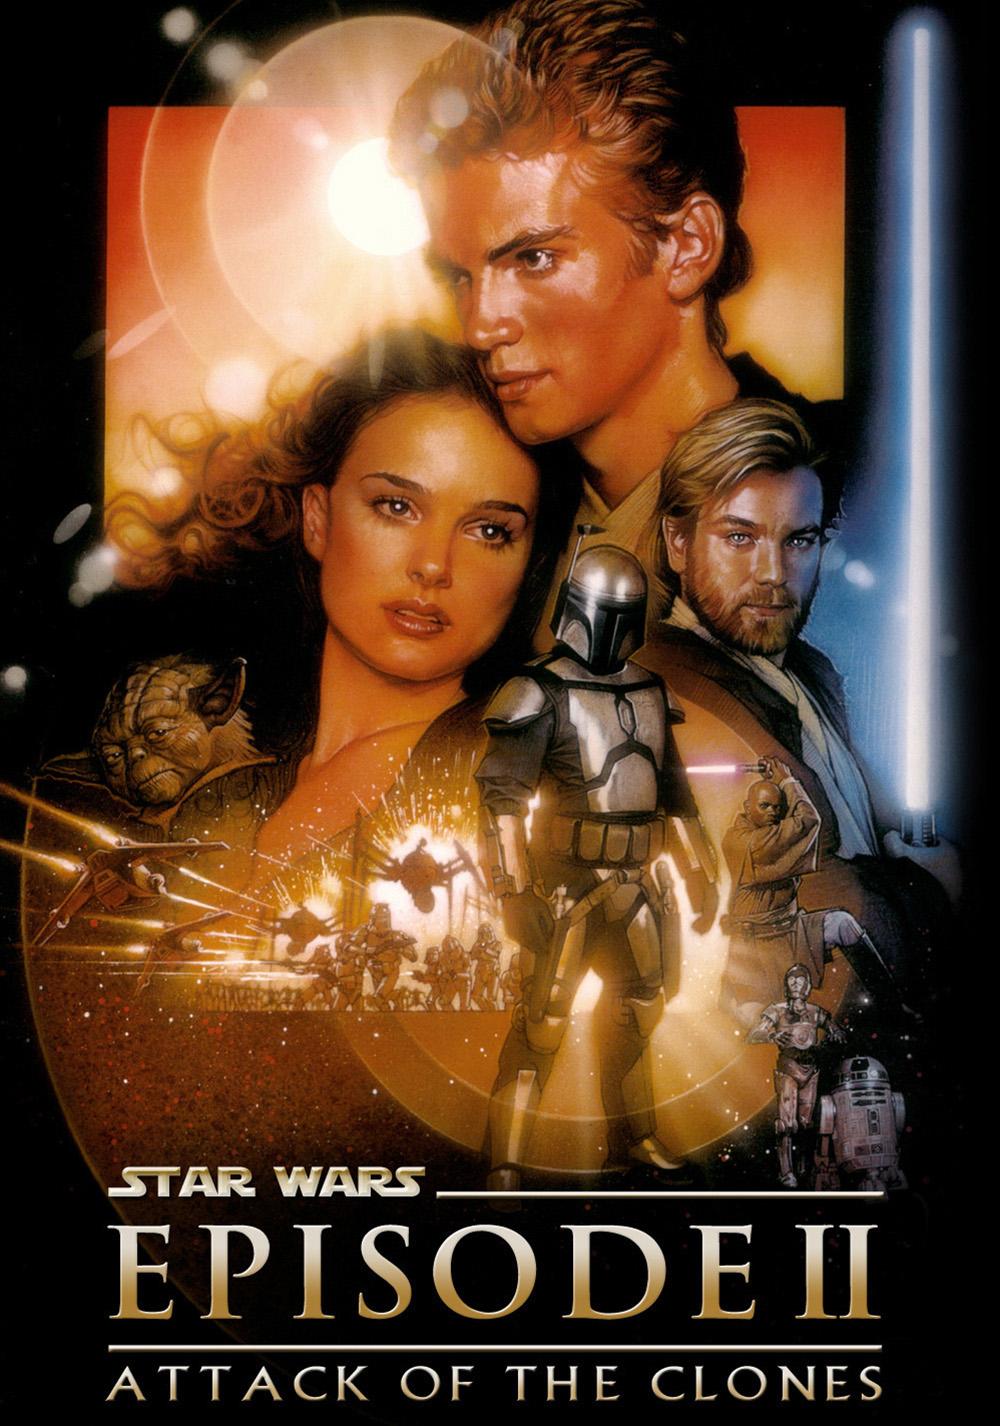 The Clone Wars Film